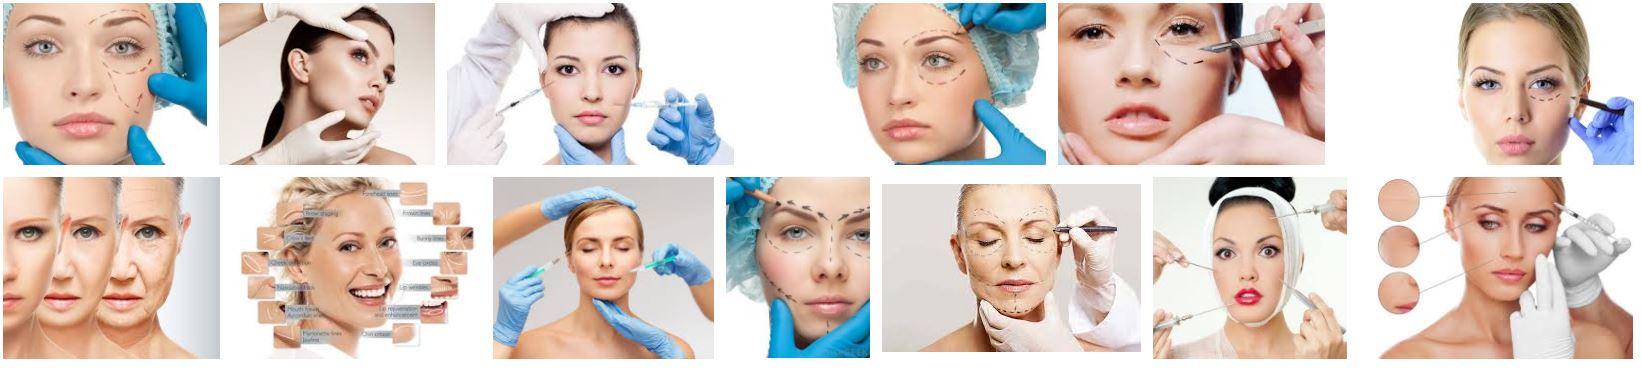 Australian Cosmetic Surgery